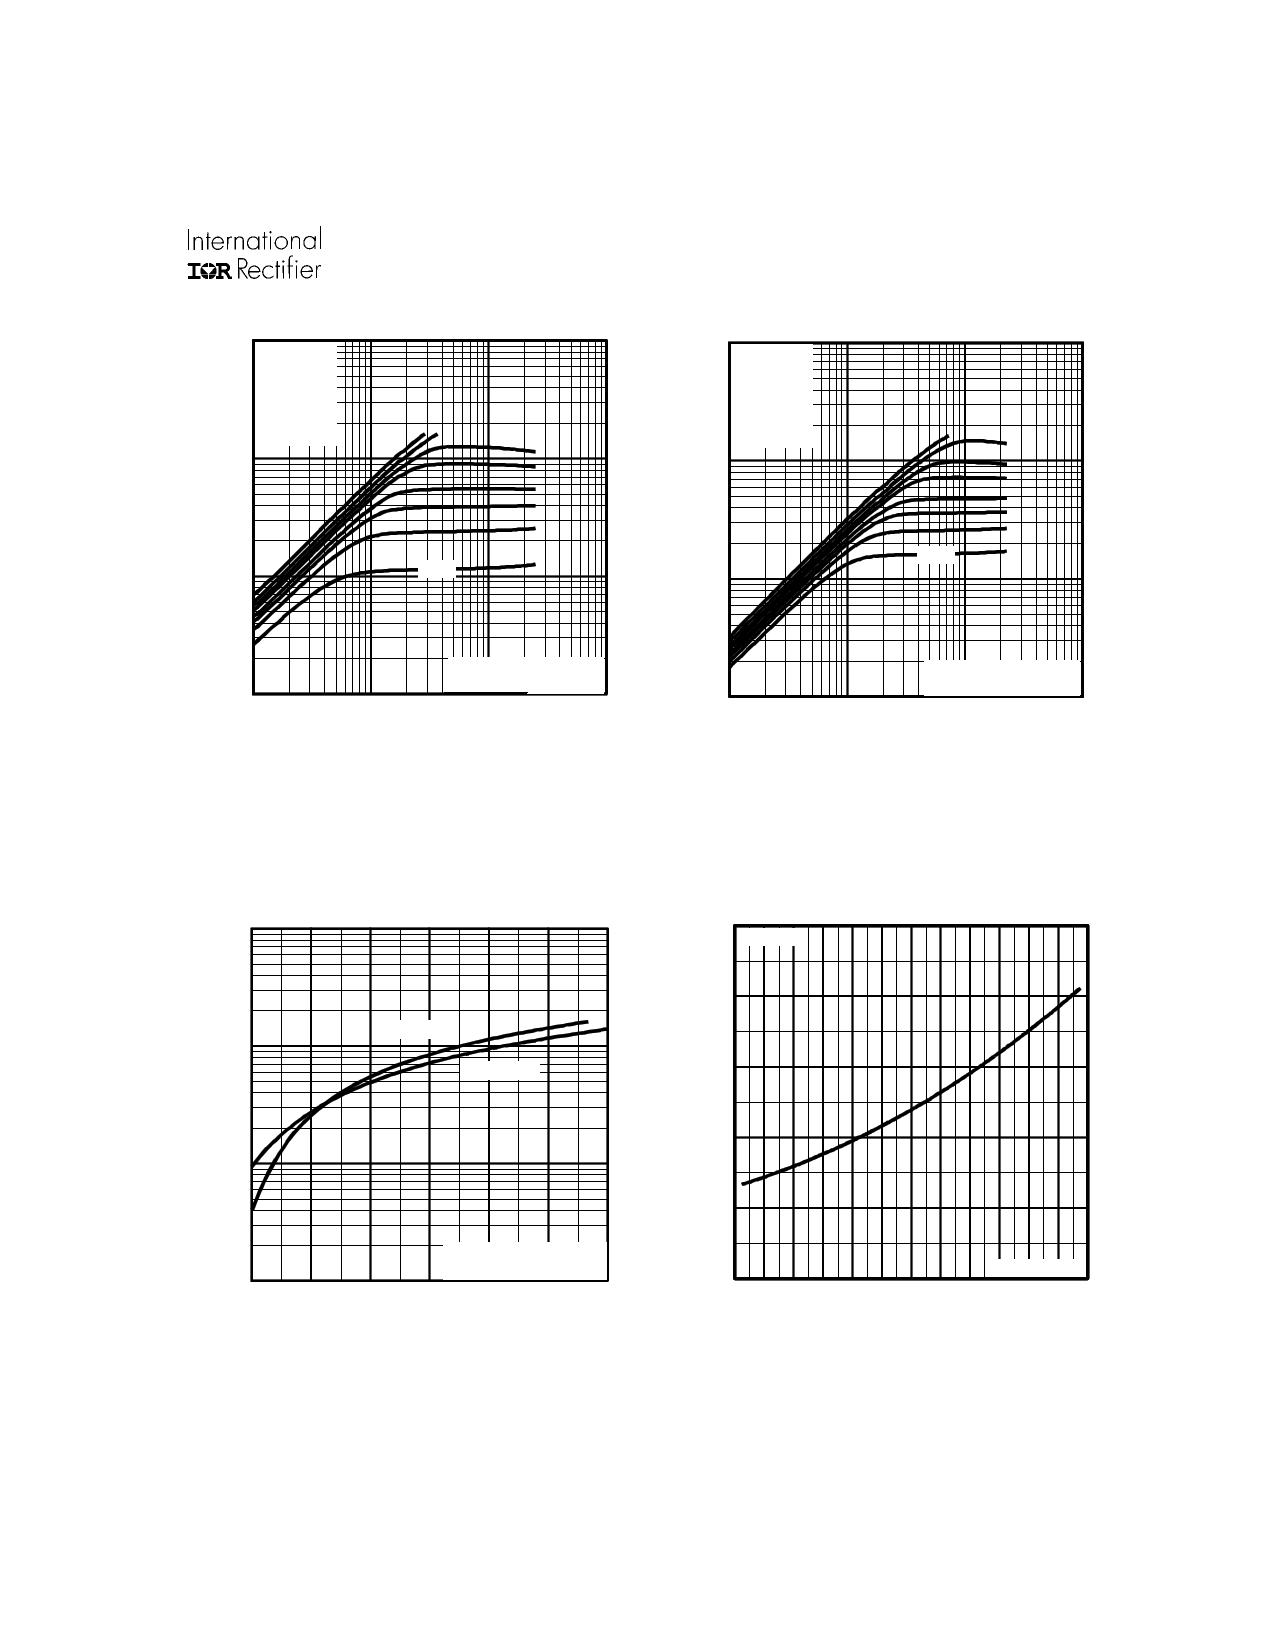 IRFZ44NS pdf, ピン配列